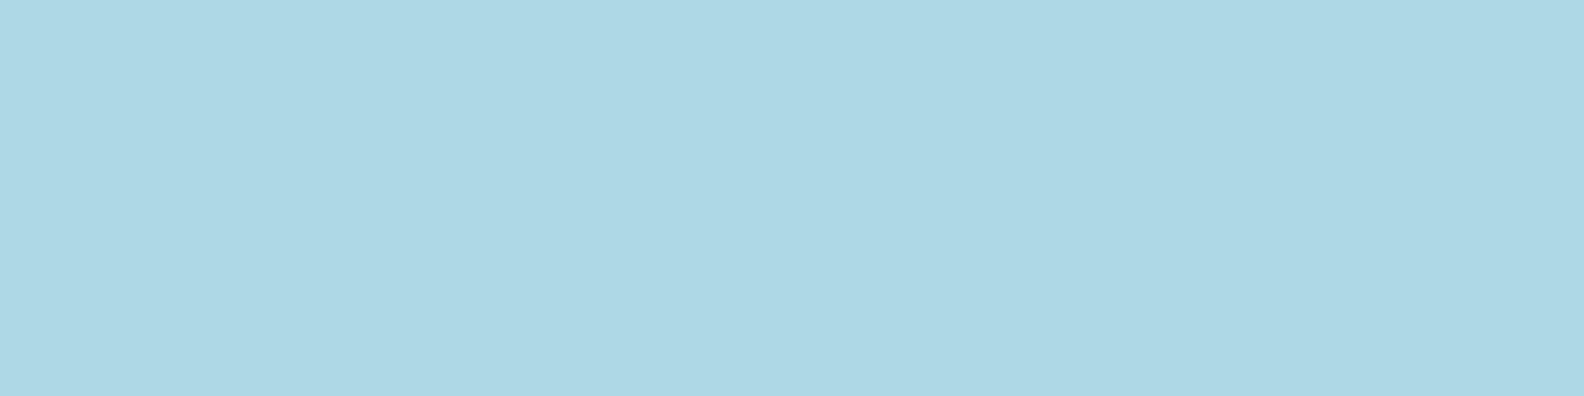 1584x396 Light Blue Solid Color Background